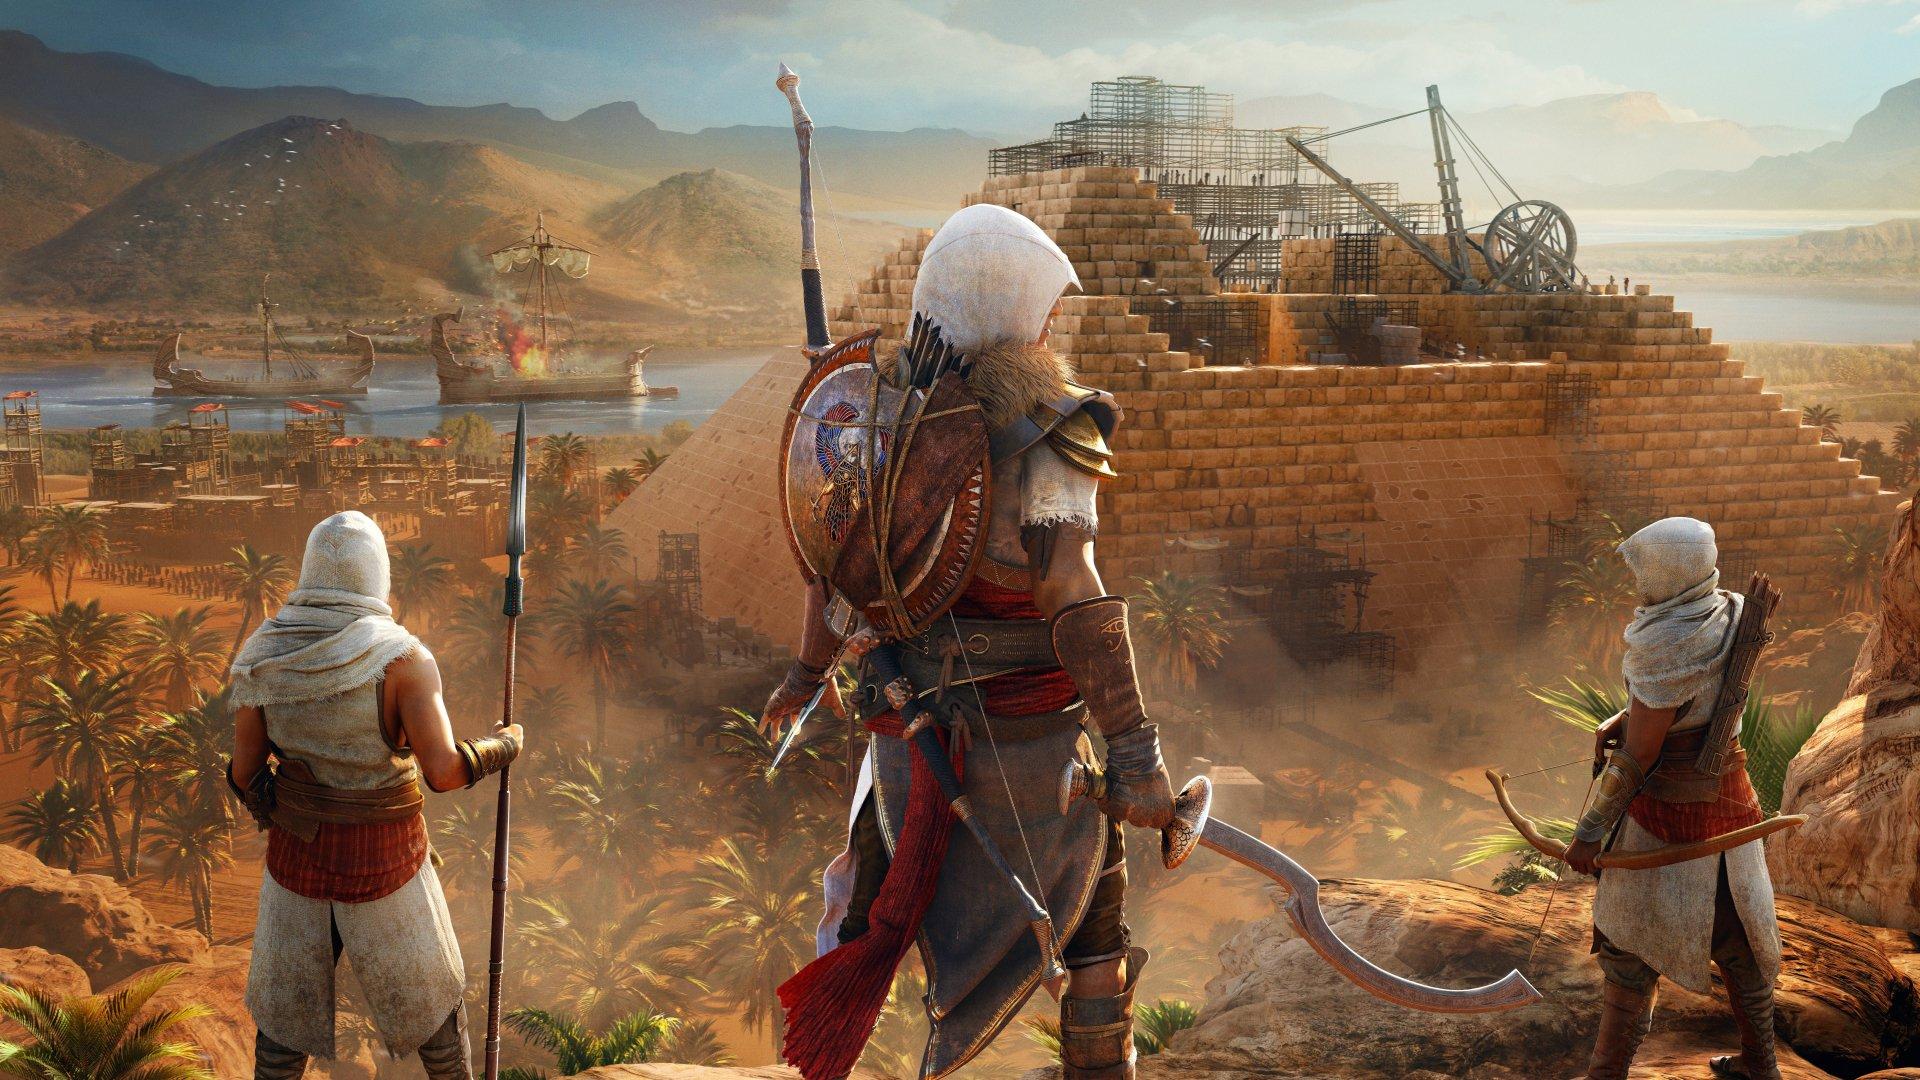 Video Game - Assassin's Creed Origins  Wallpaper